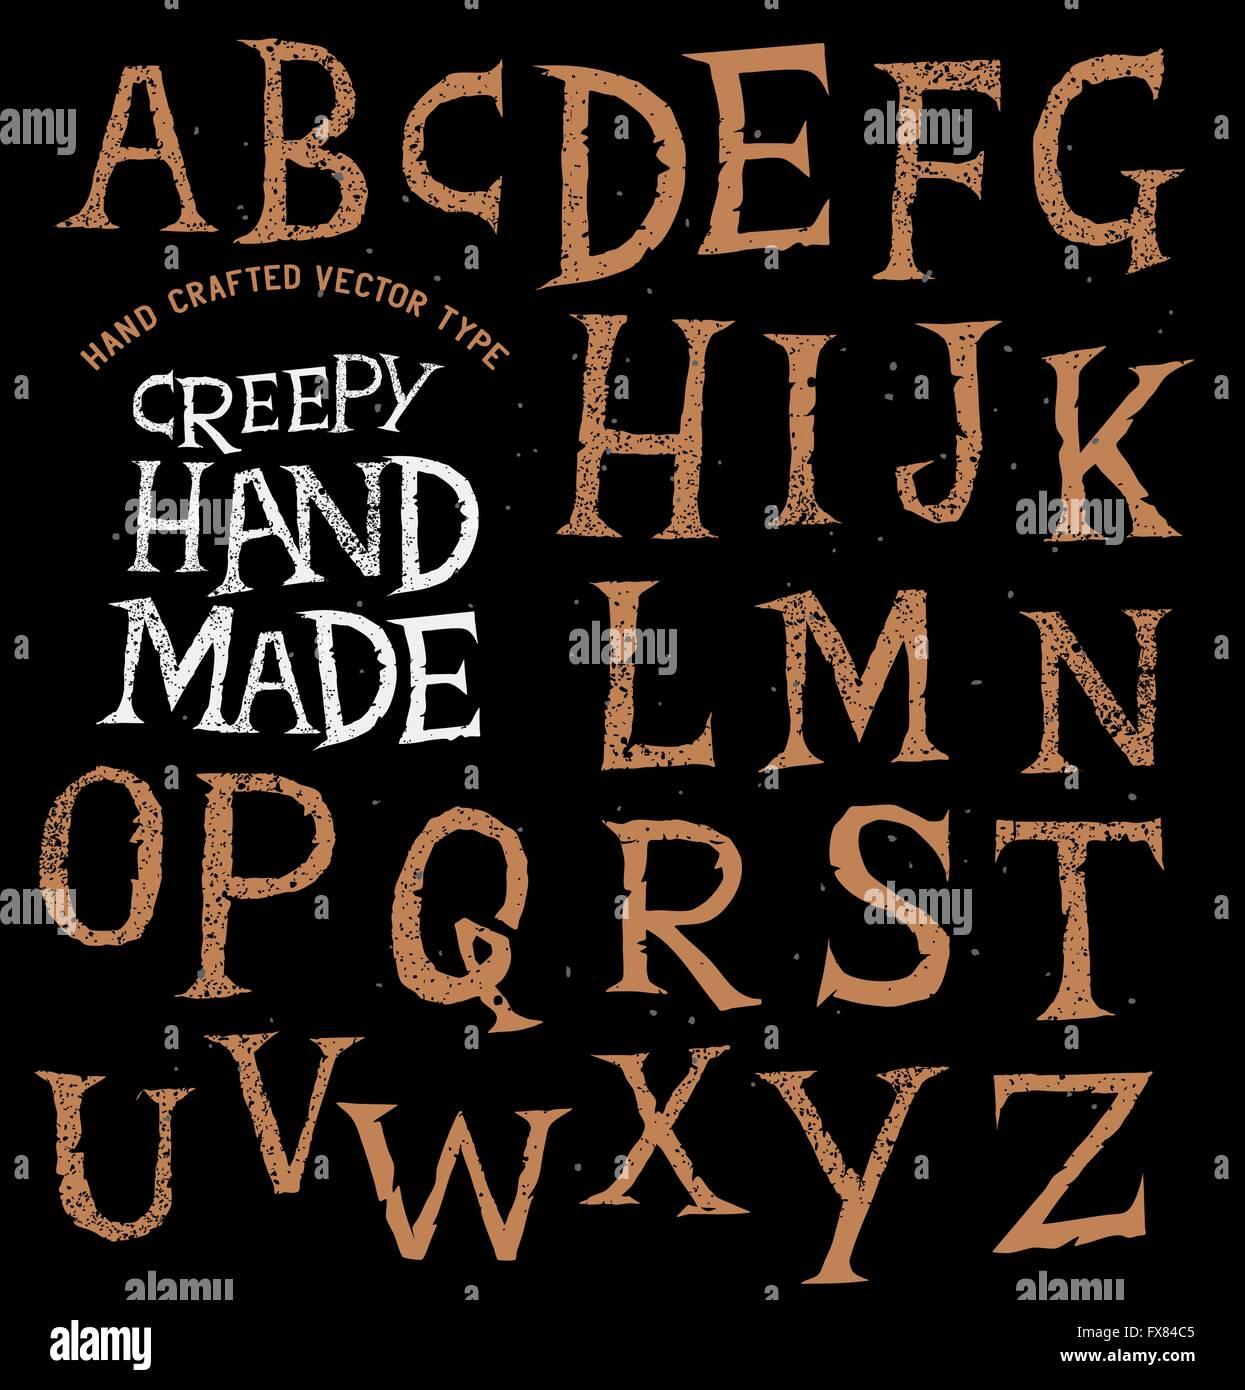 Lettrage fait main ancien Creepy. vector illustration. Photo Stock